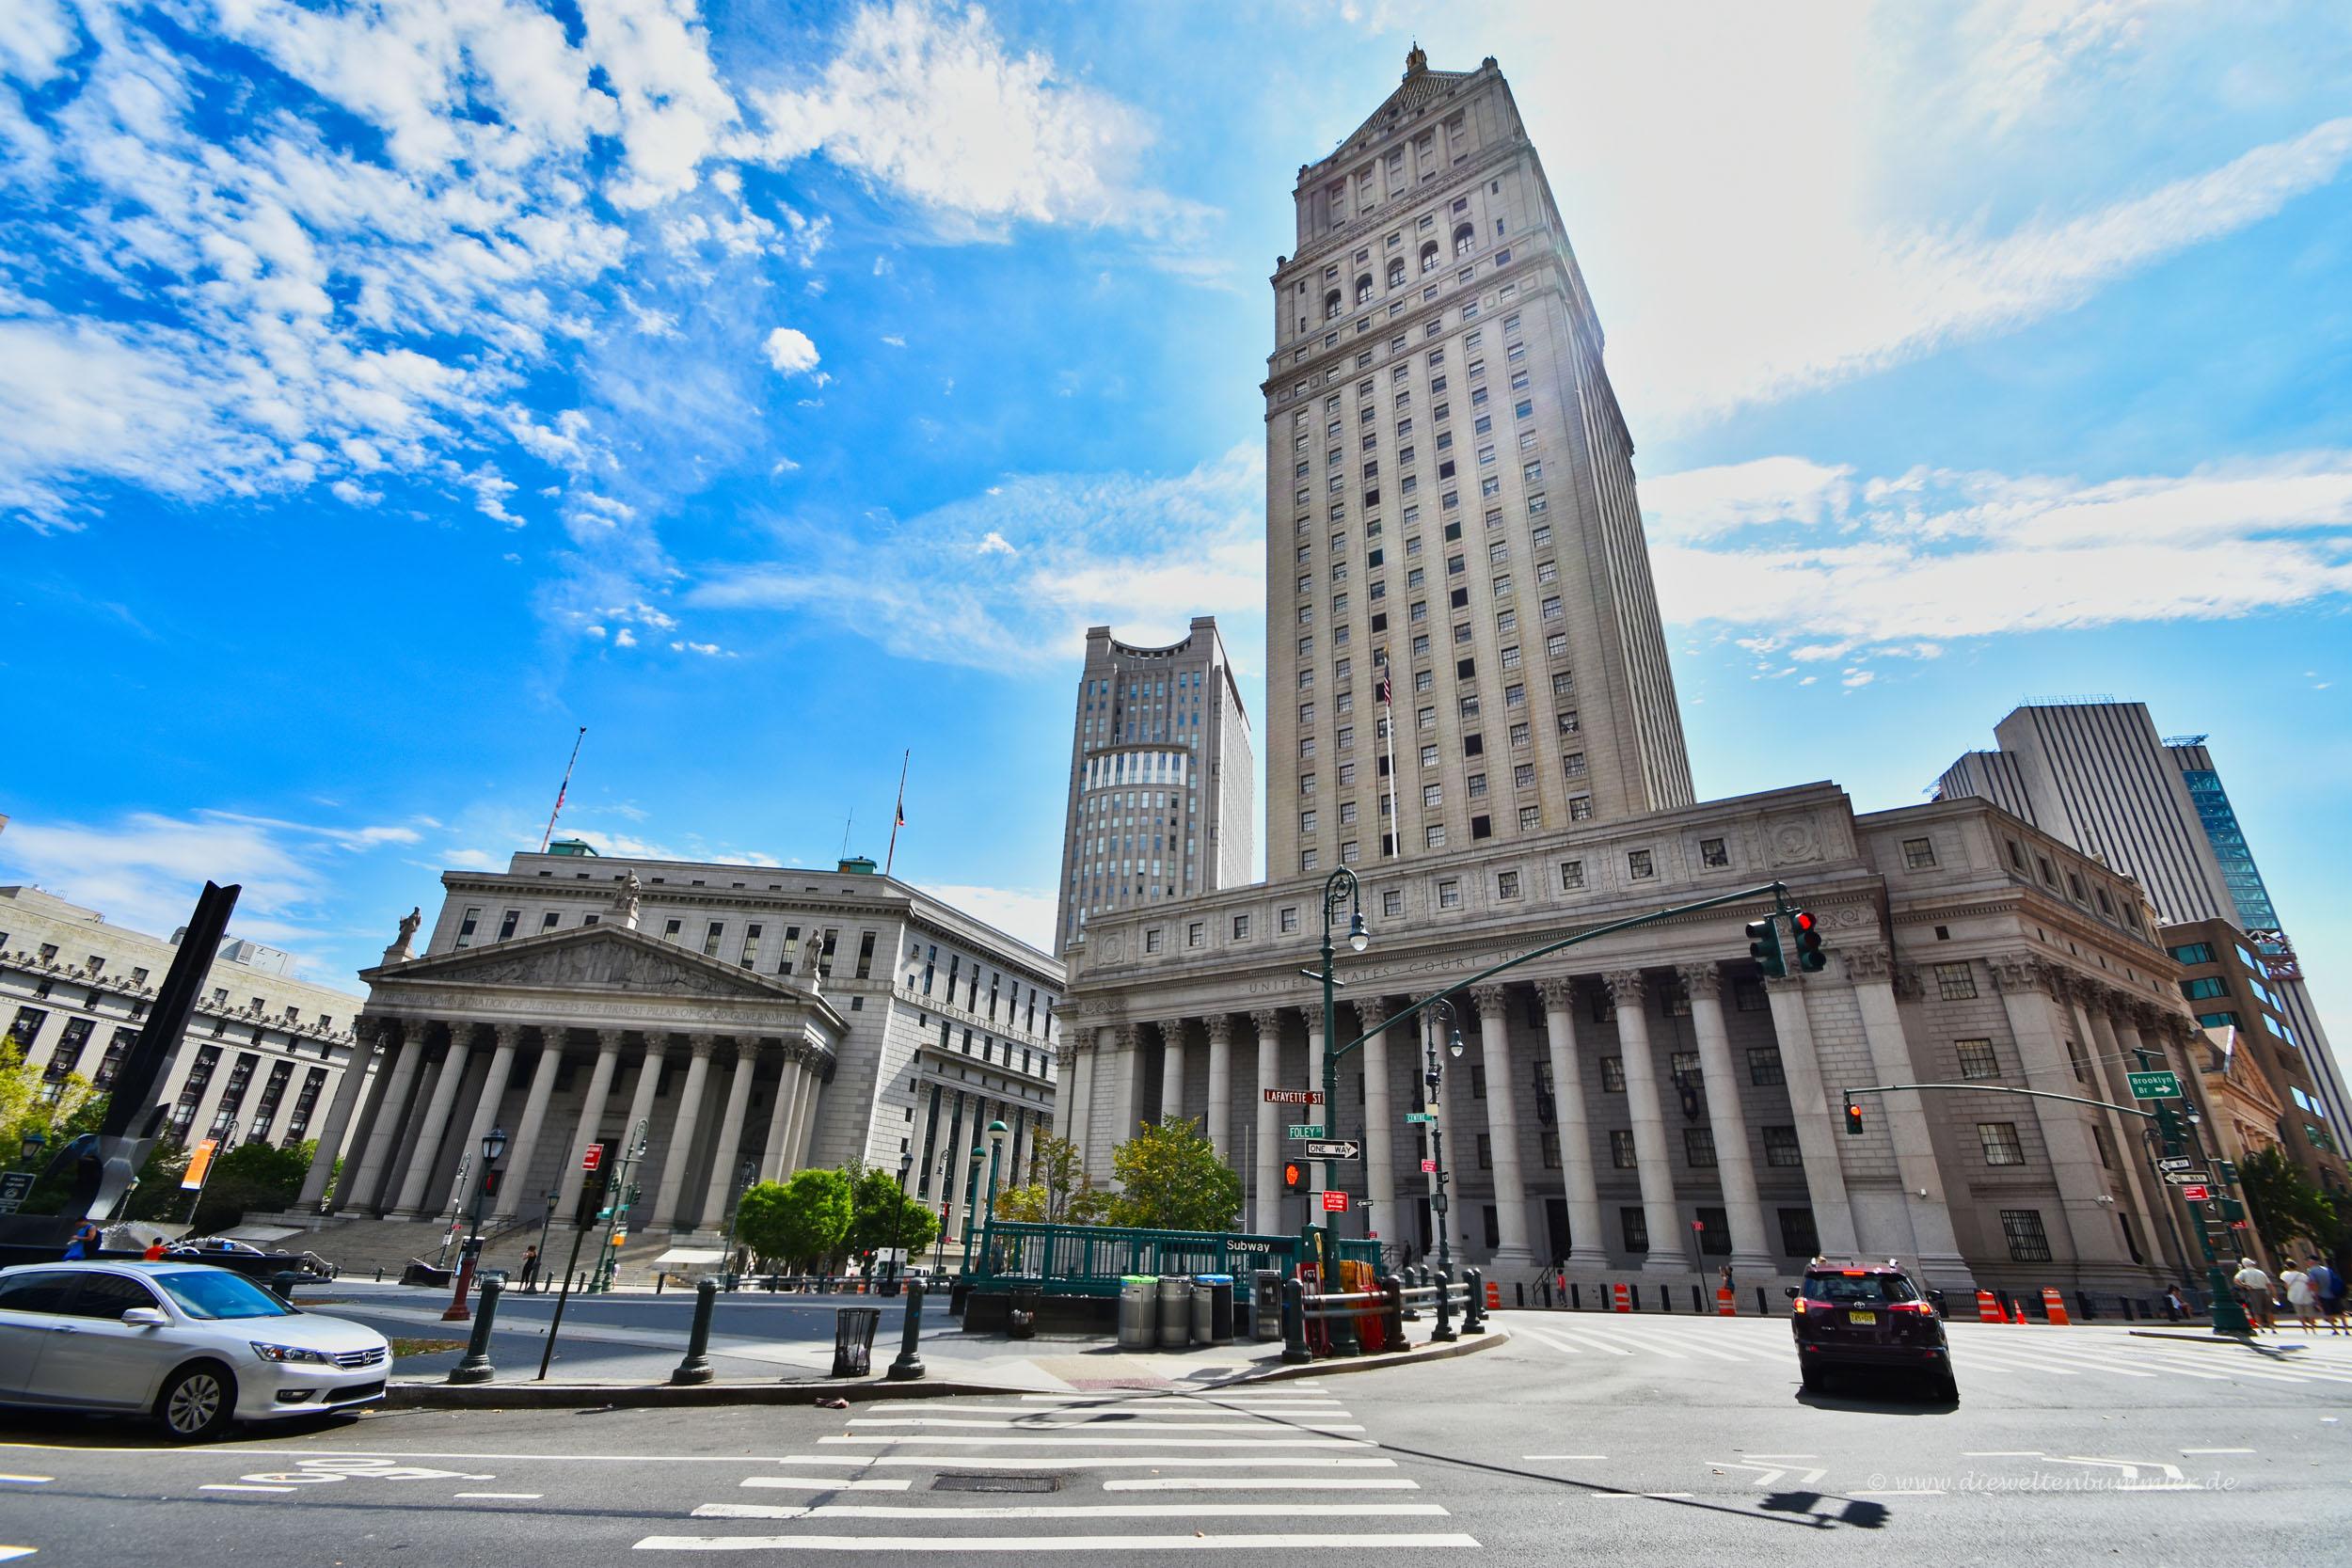 Gerichtsgebäude in New York